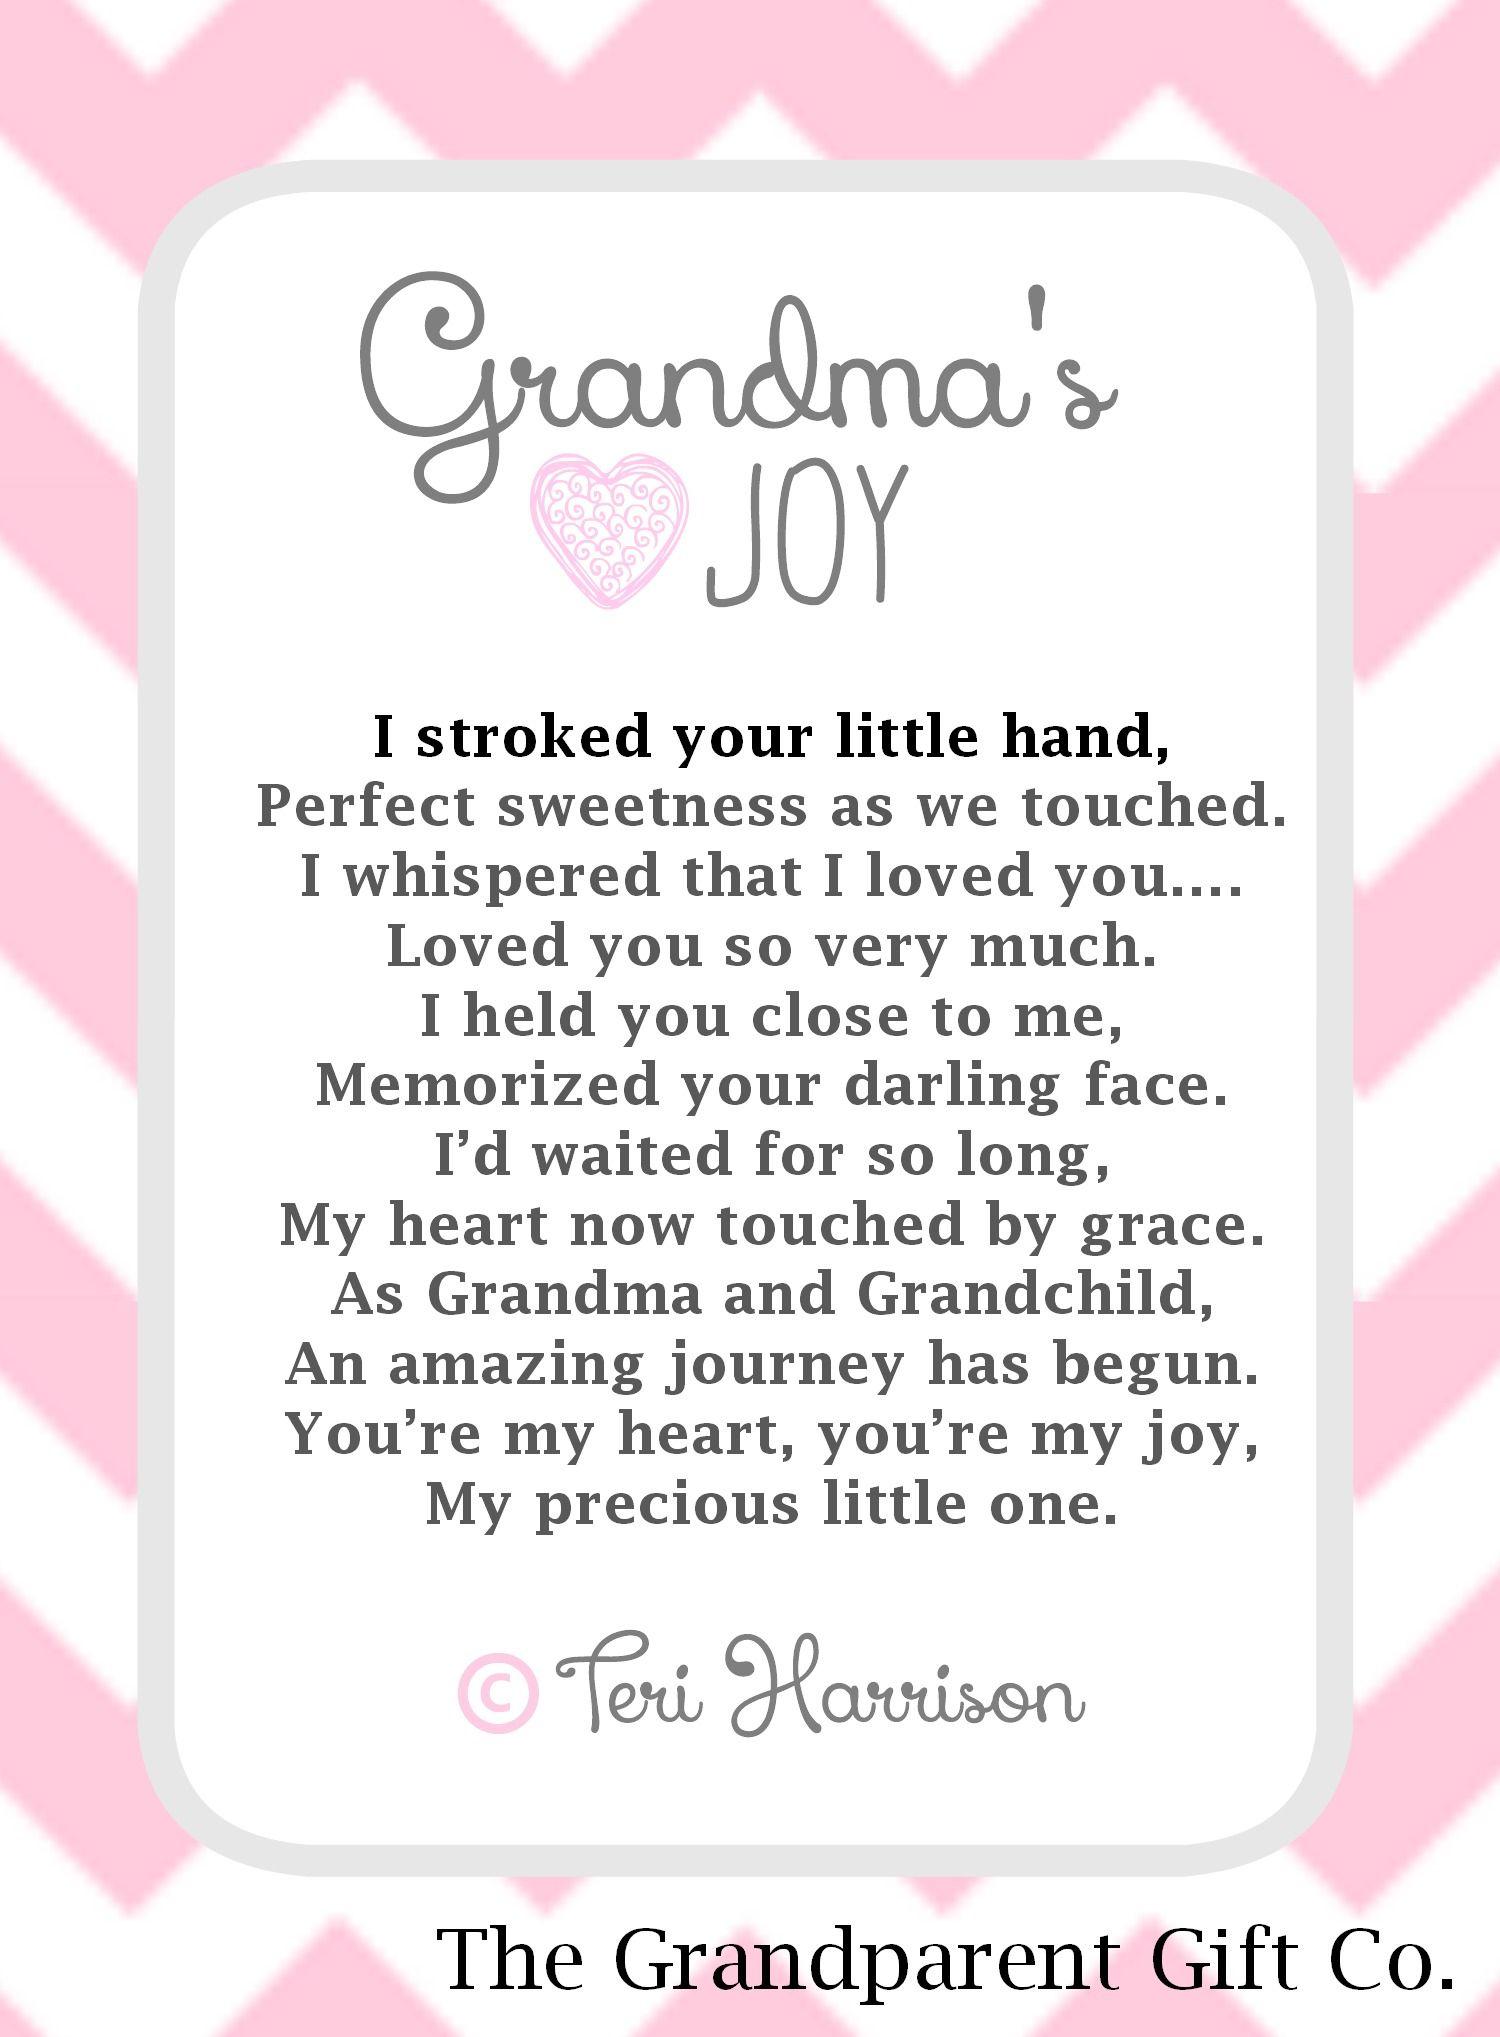 Grandparent - Wikipedia